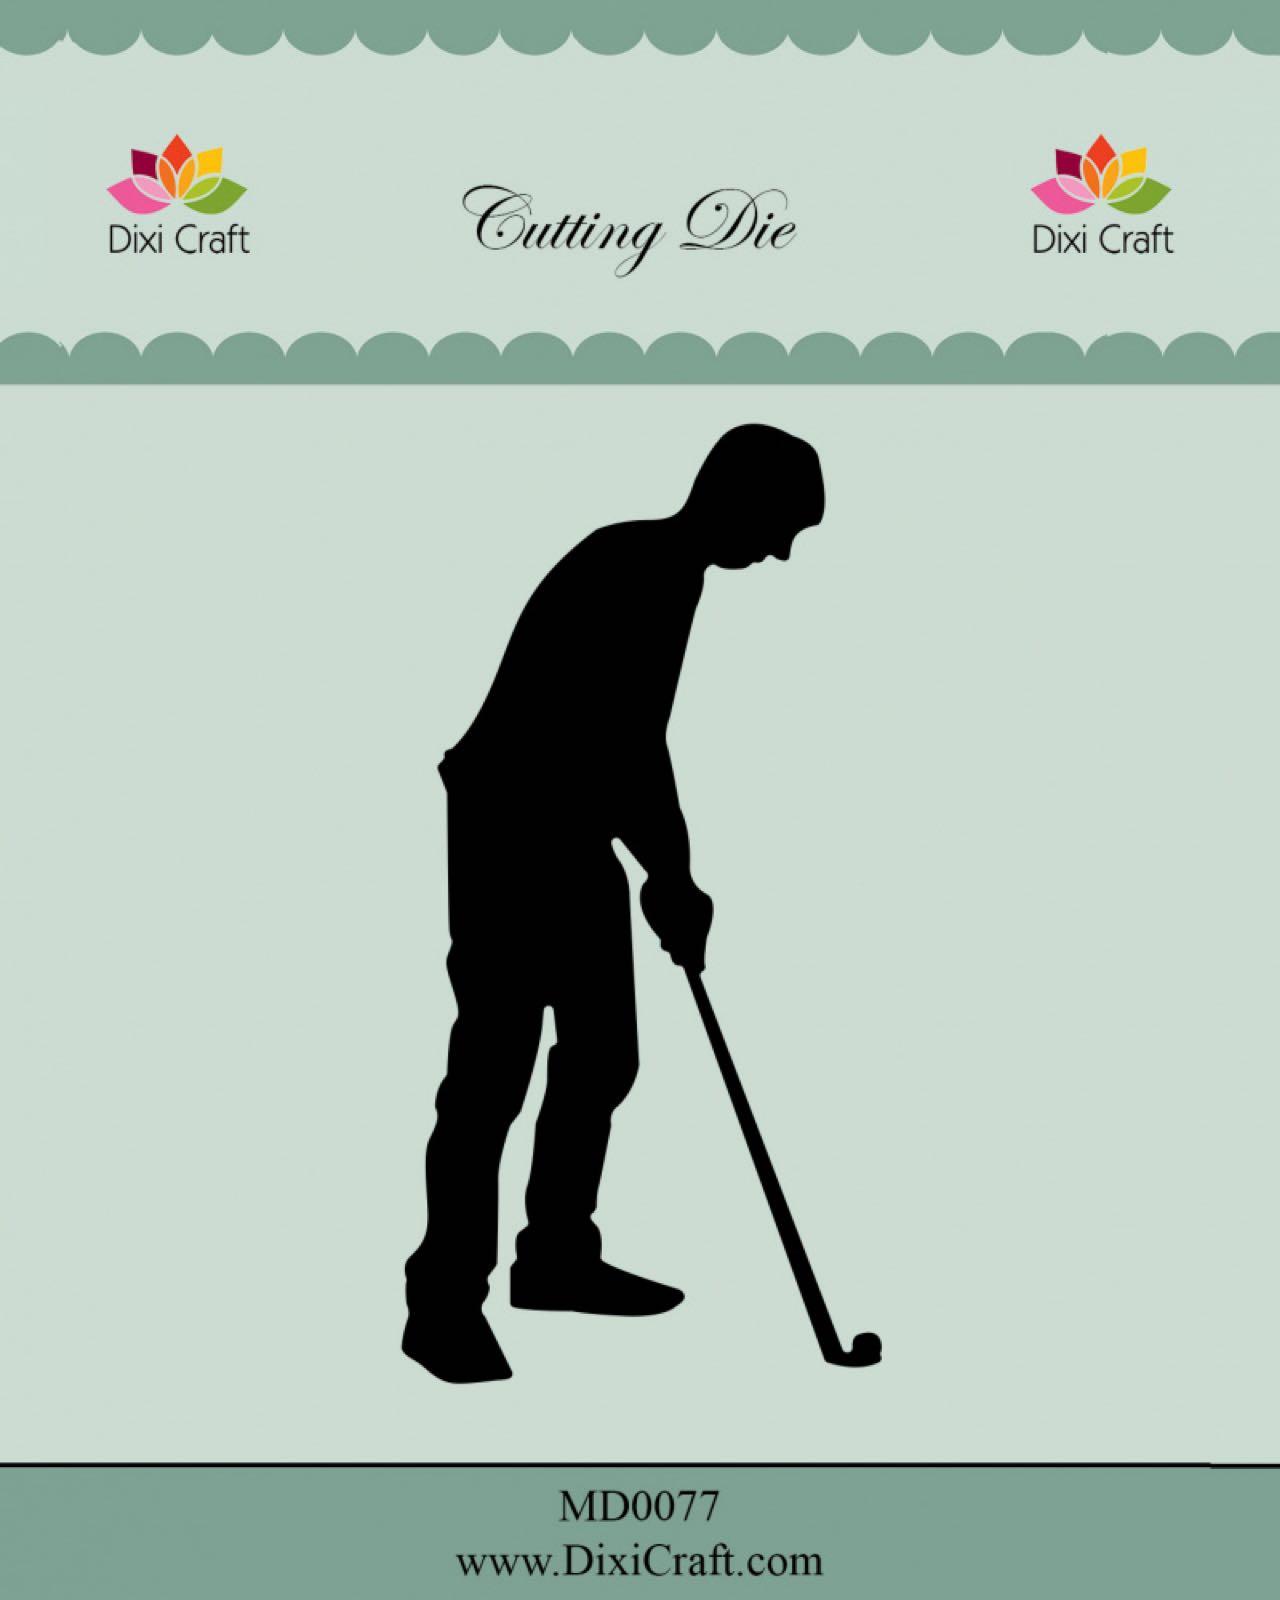 Dixi craft cutting die golf